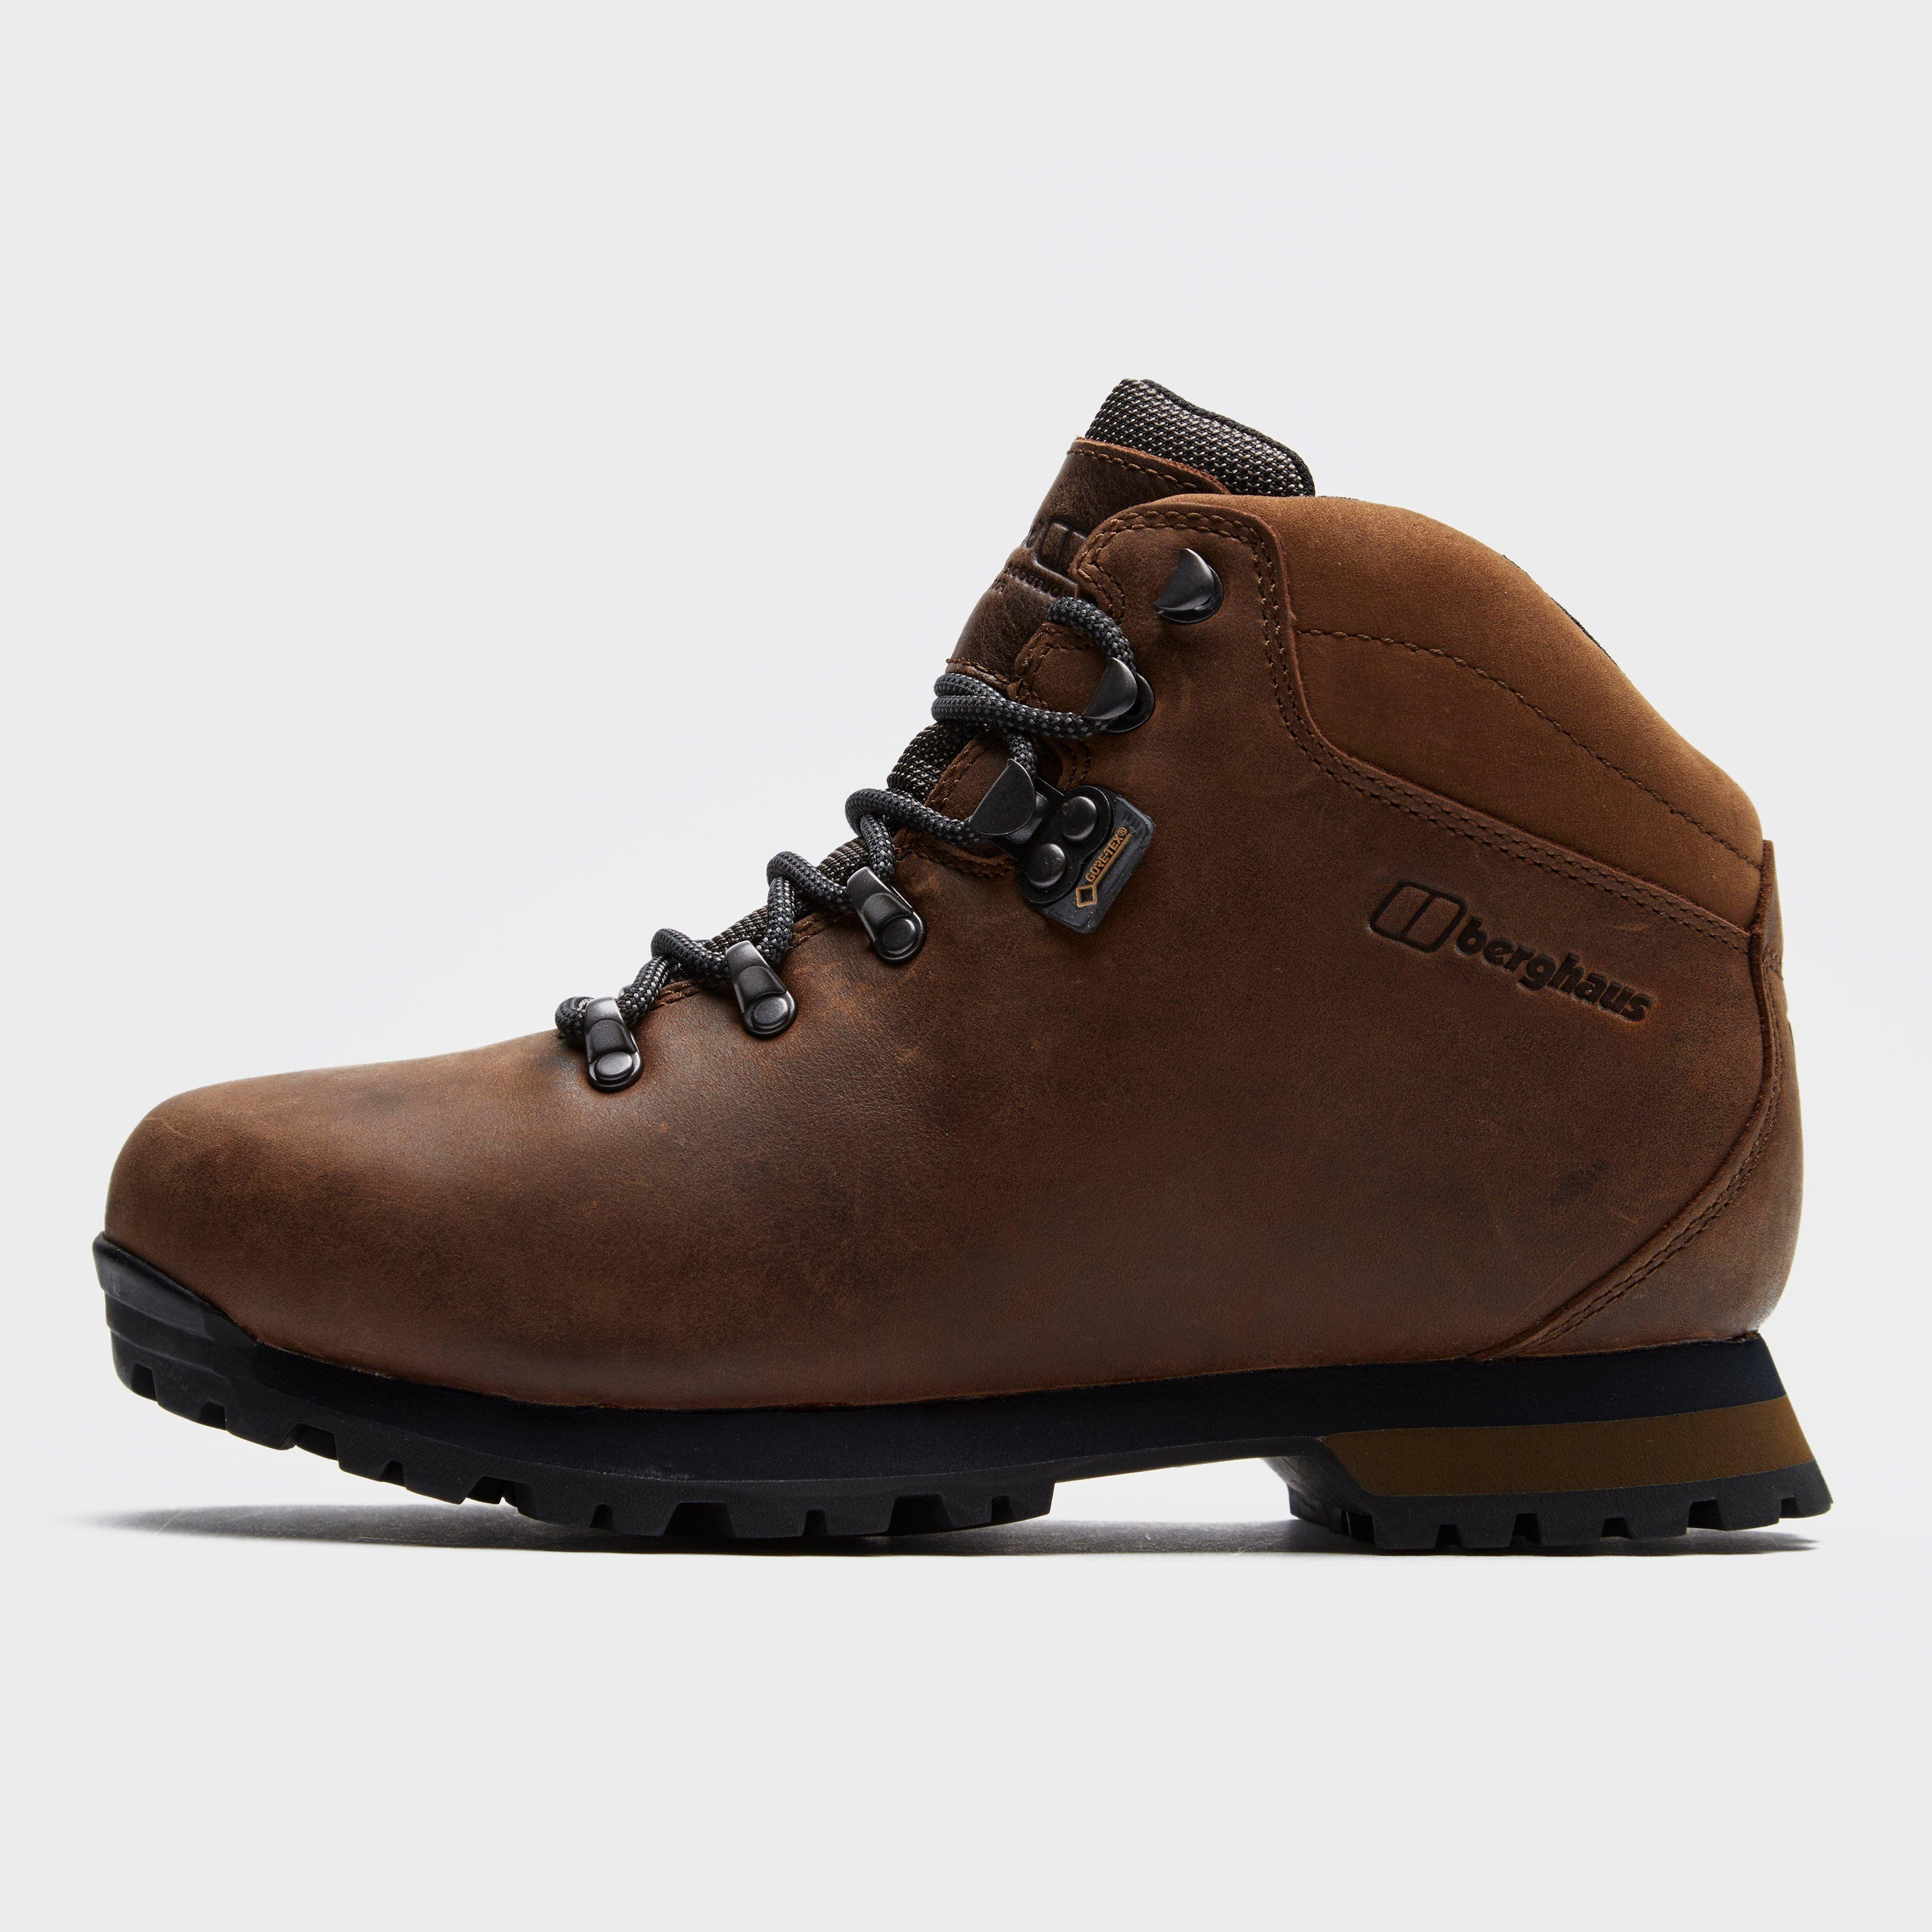 BERGHAUS Women's Hillwalker II GORE-TEX® Leather Walking Boot